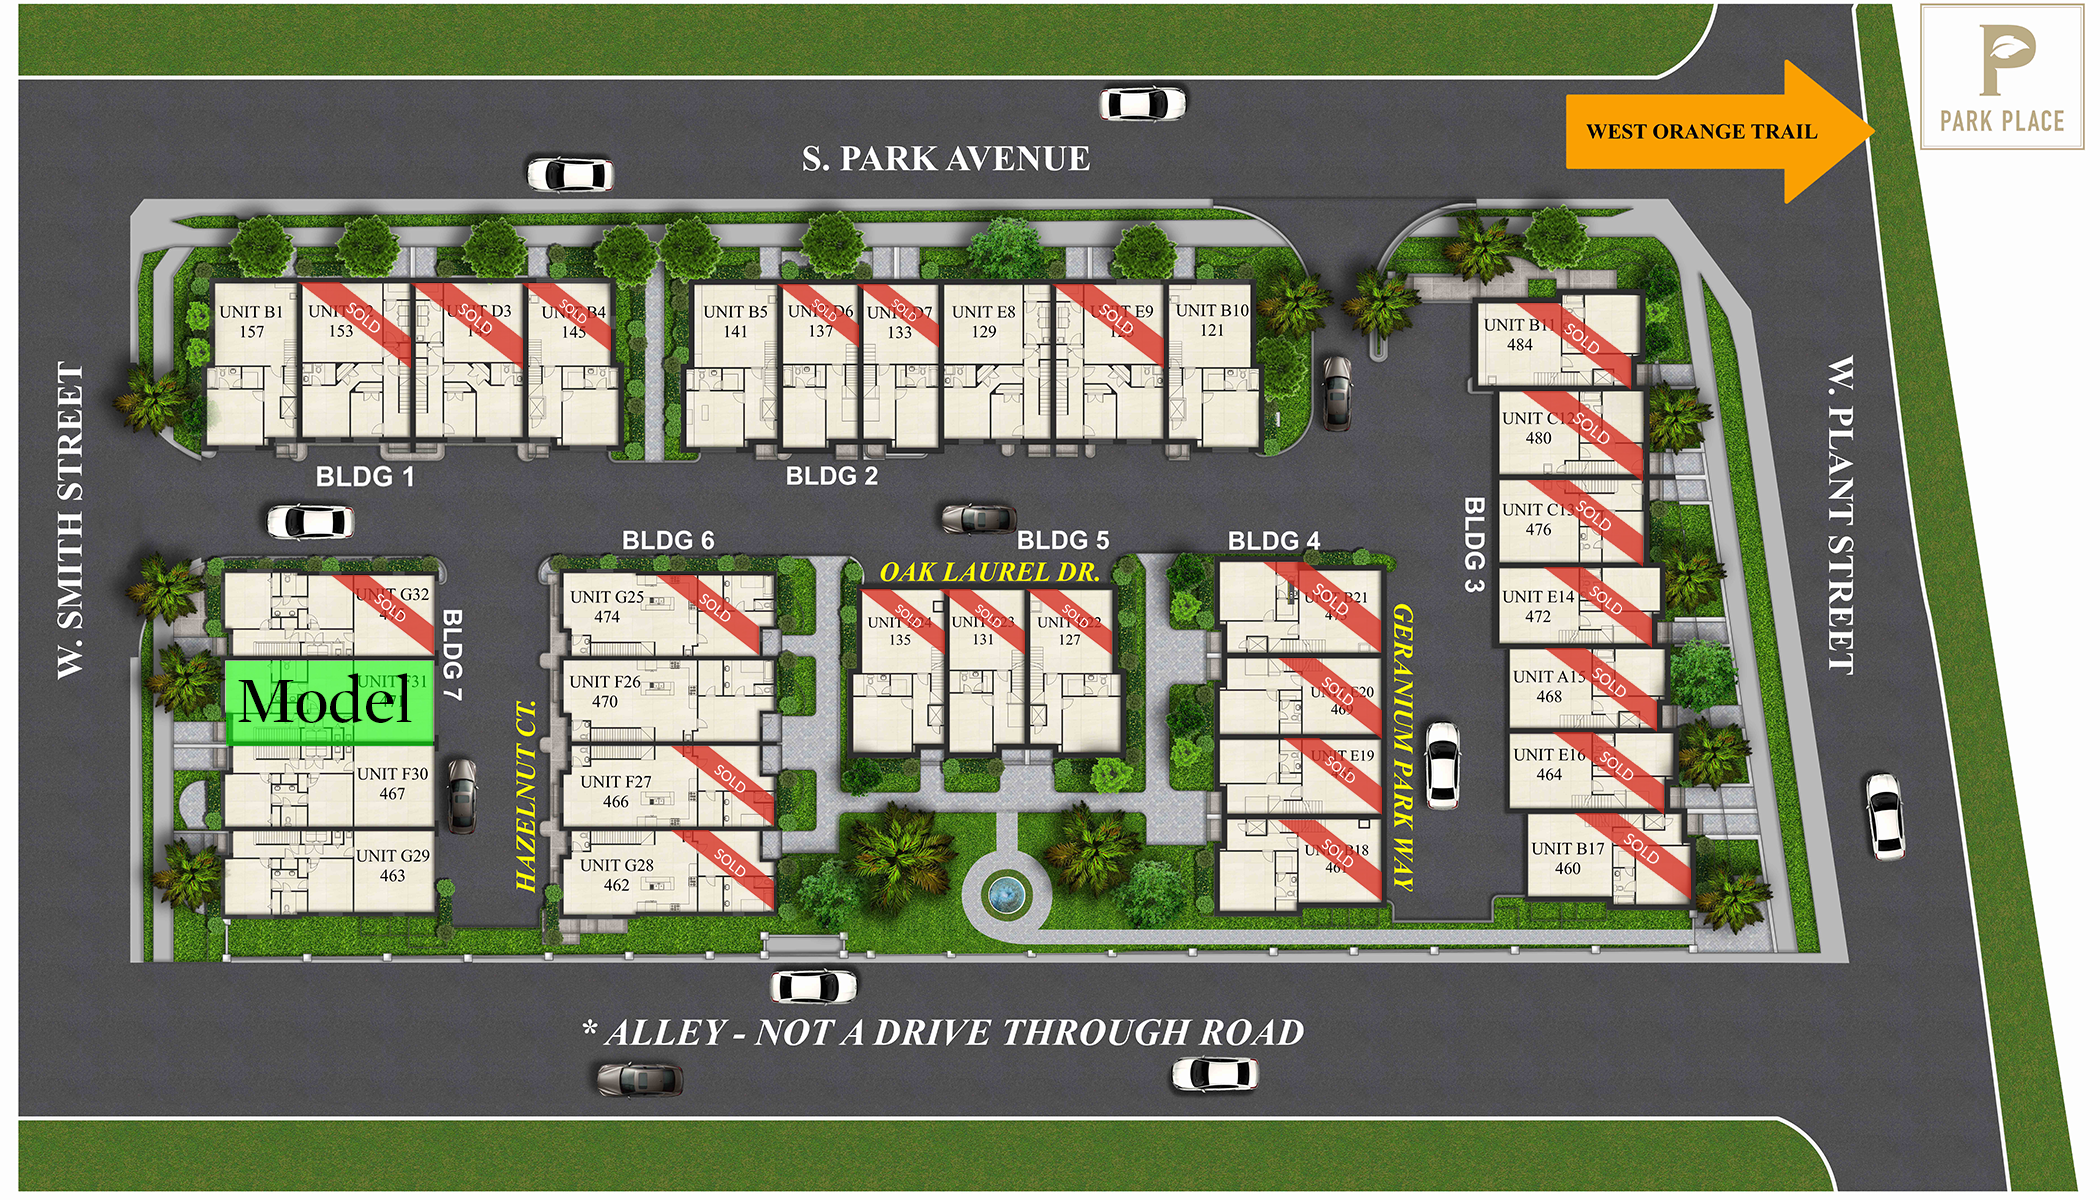 Park Place Winter Garden Site plan